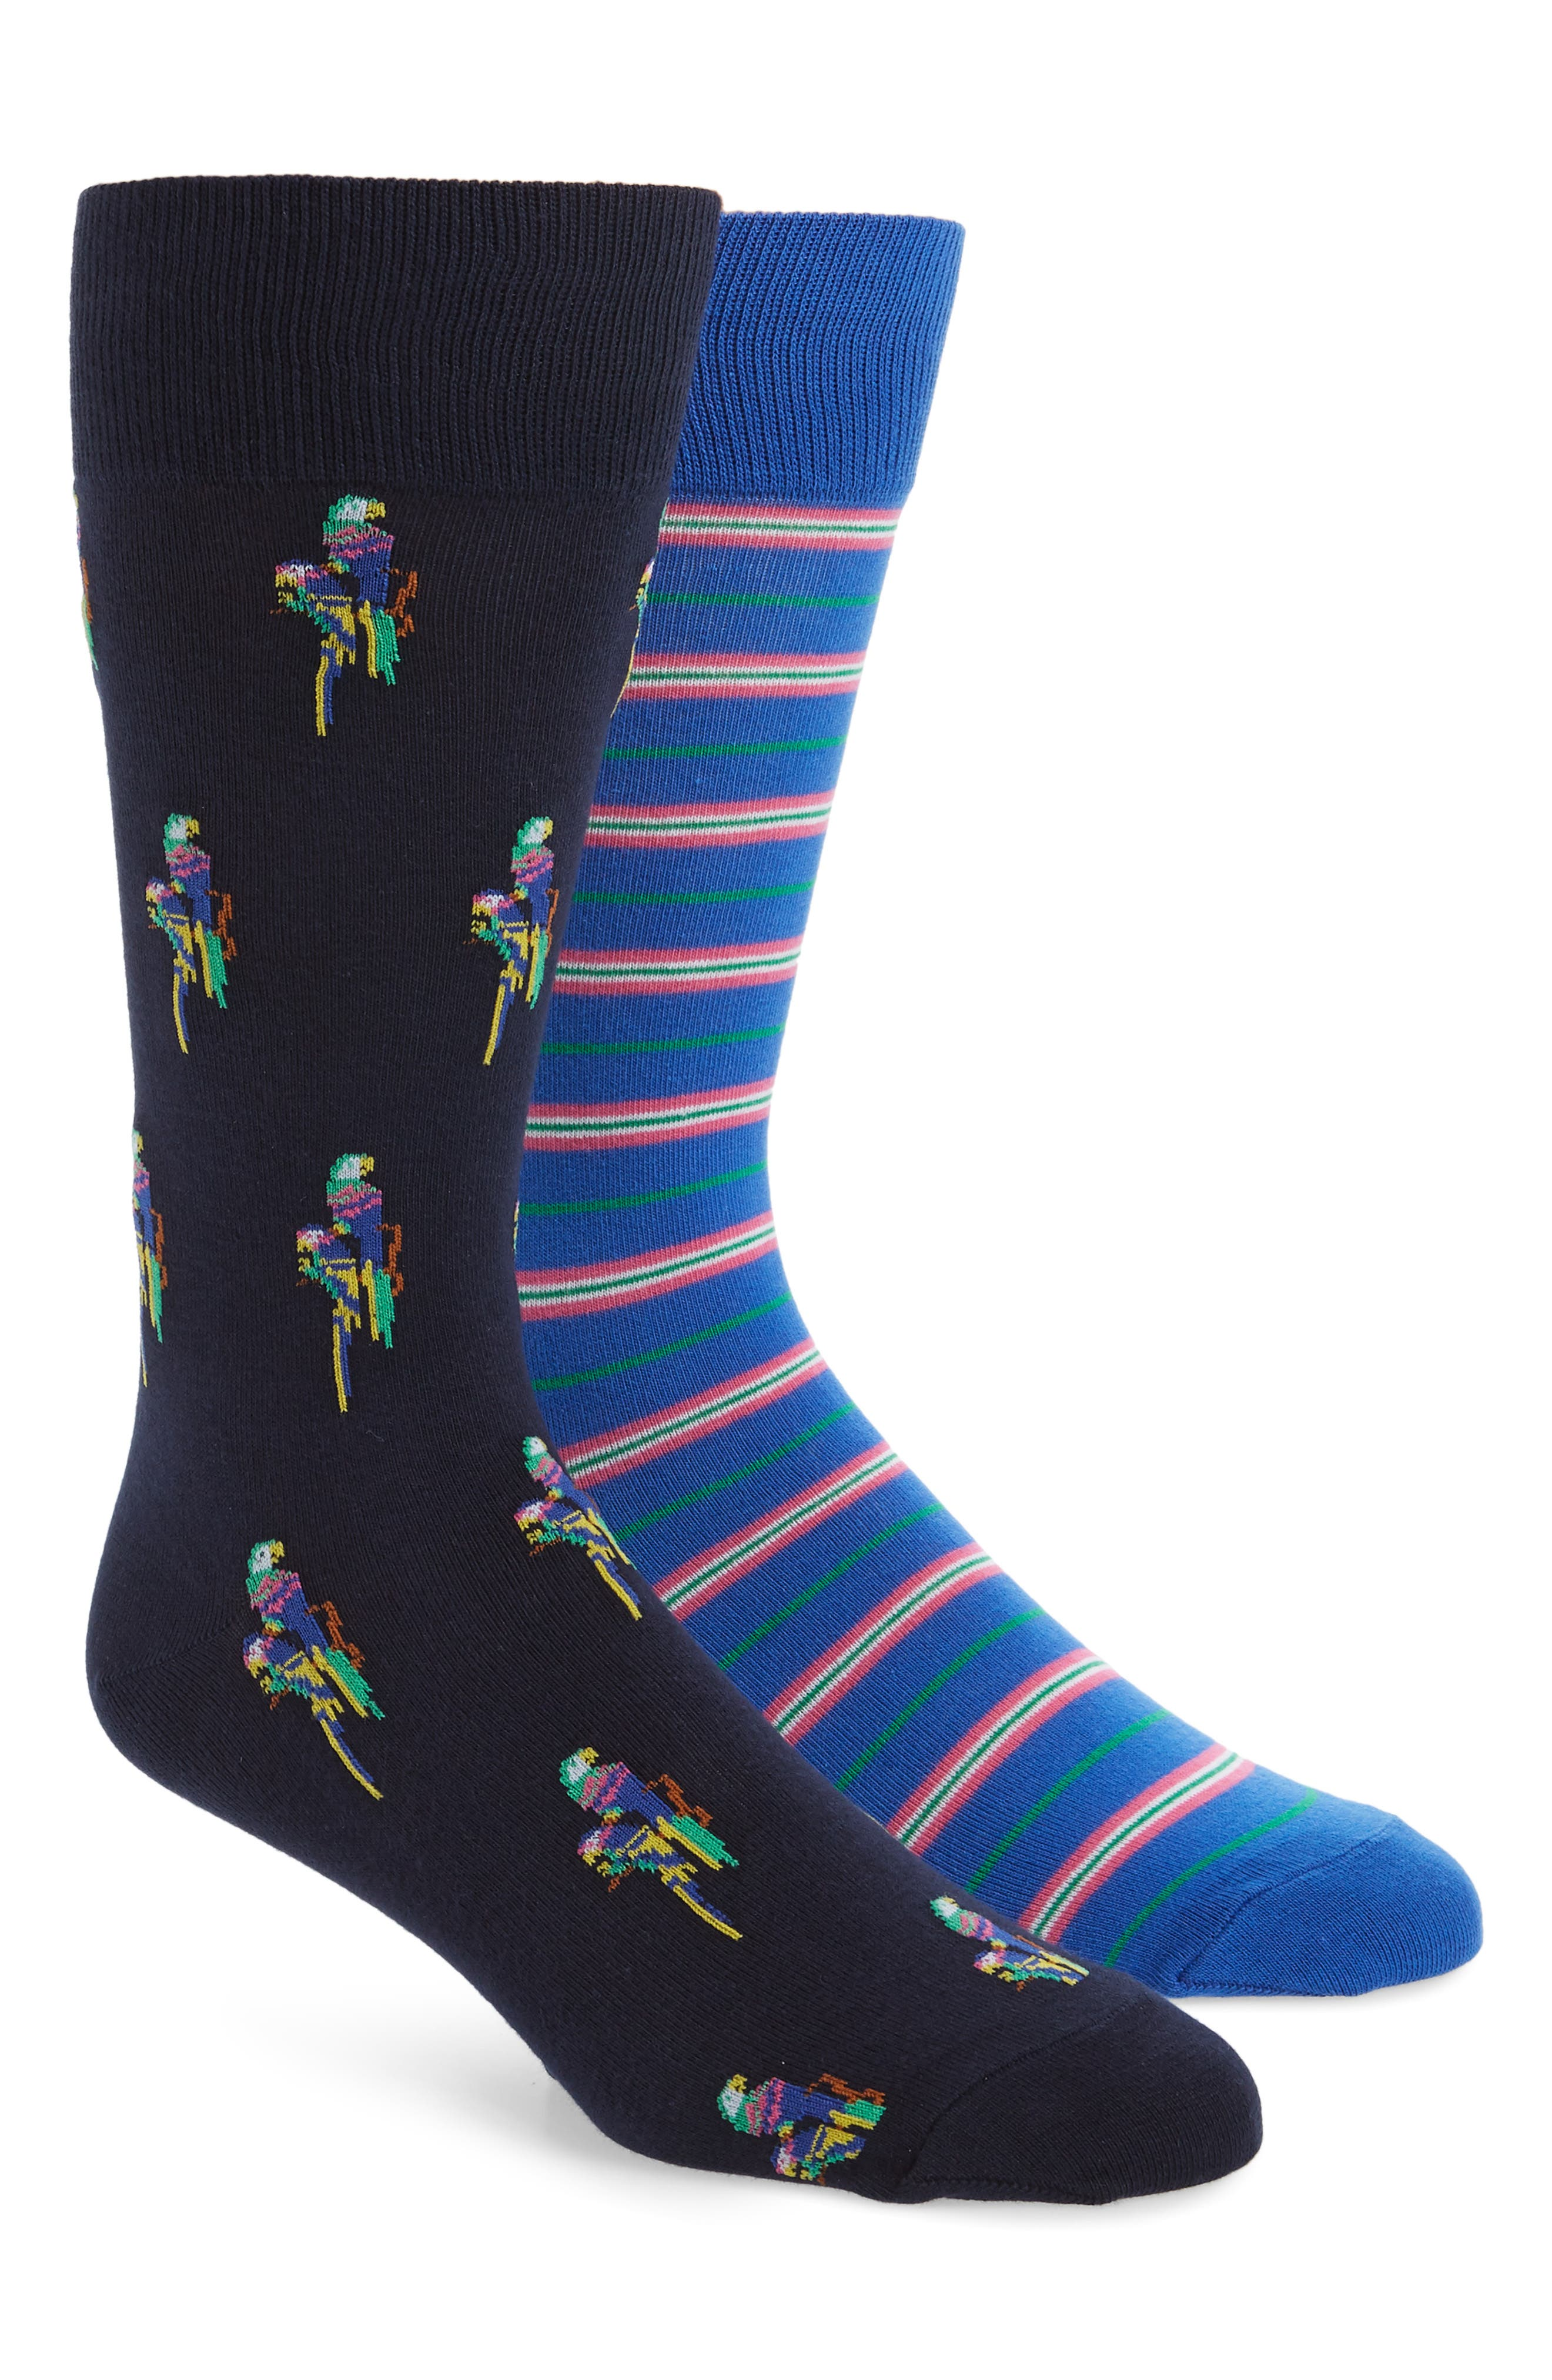 2-Pack Parrot & Stripe Socks, Main, color, NAVY